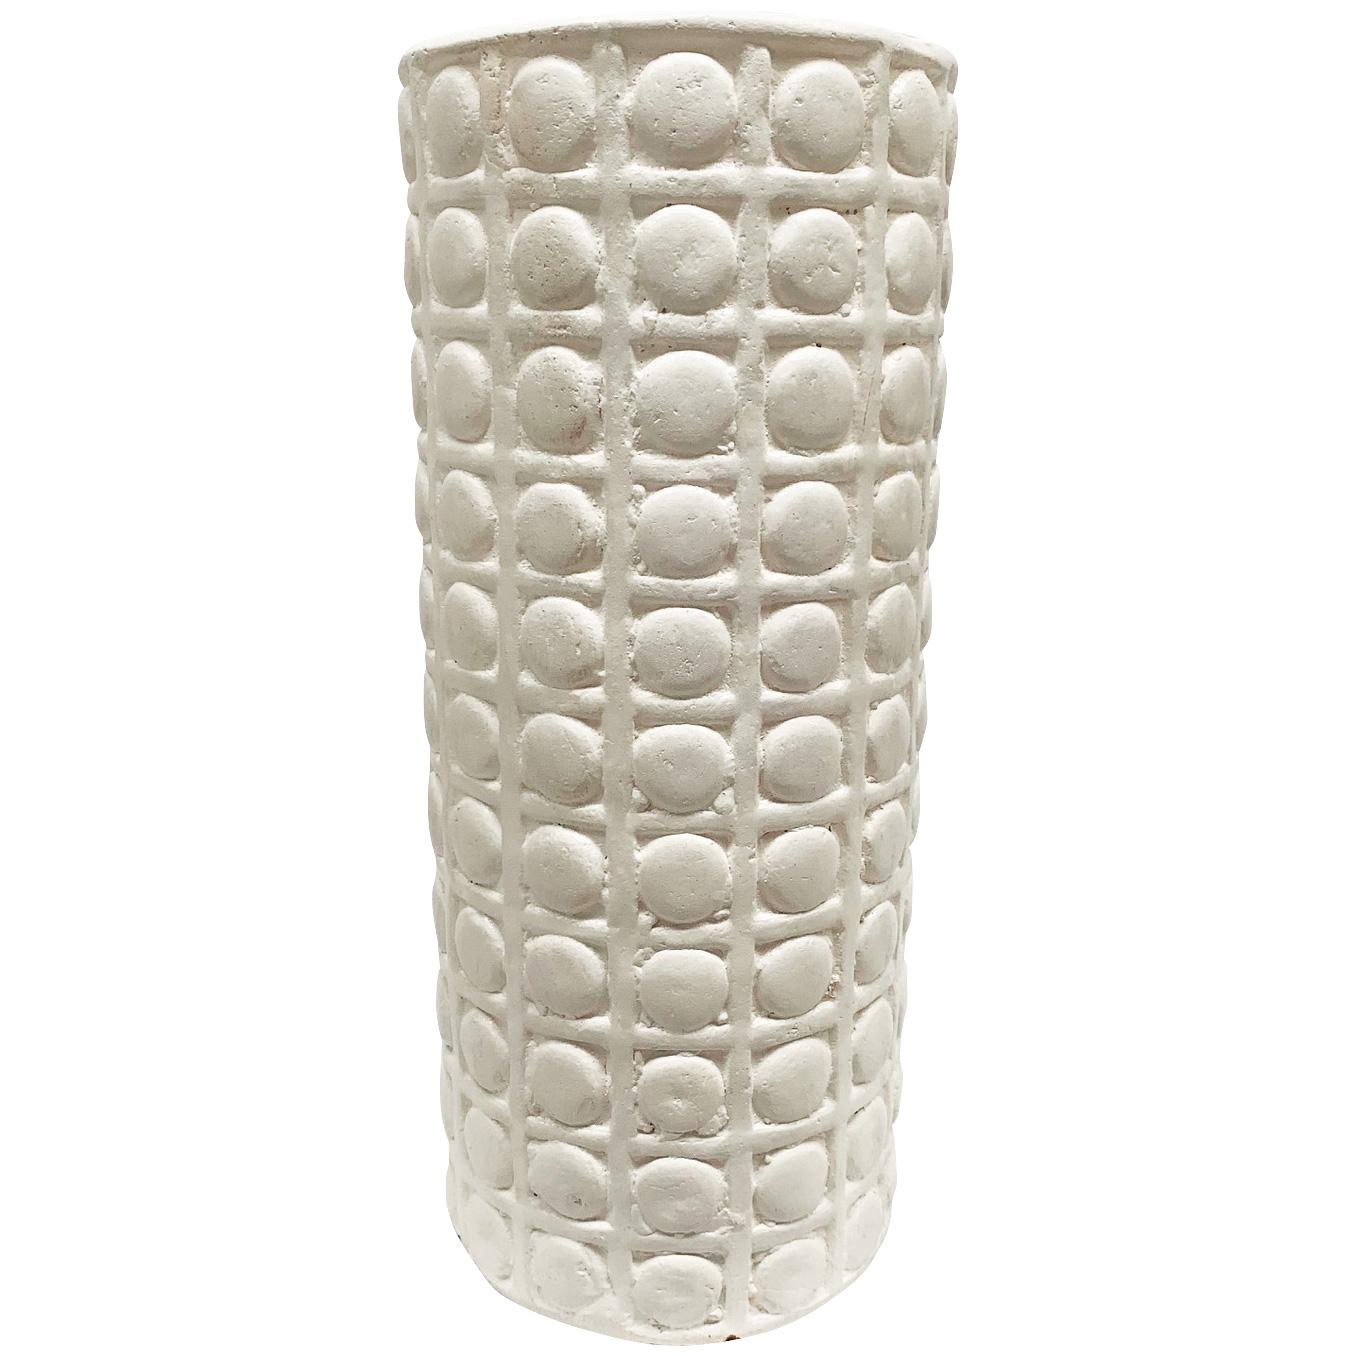 Promart | Terracotta Cilindro Esferas White Medium Cylinder Floor Vase